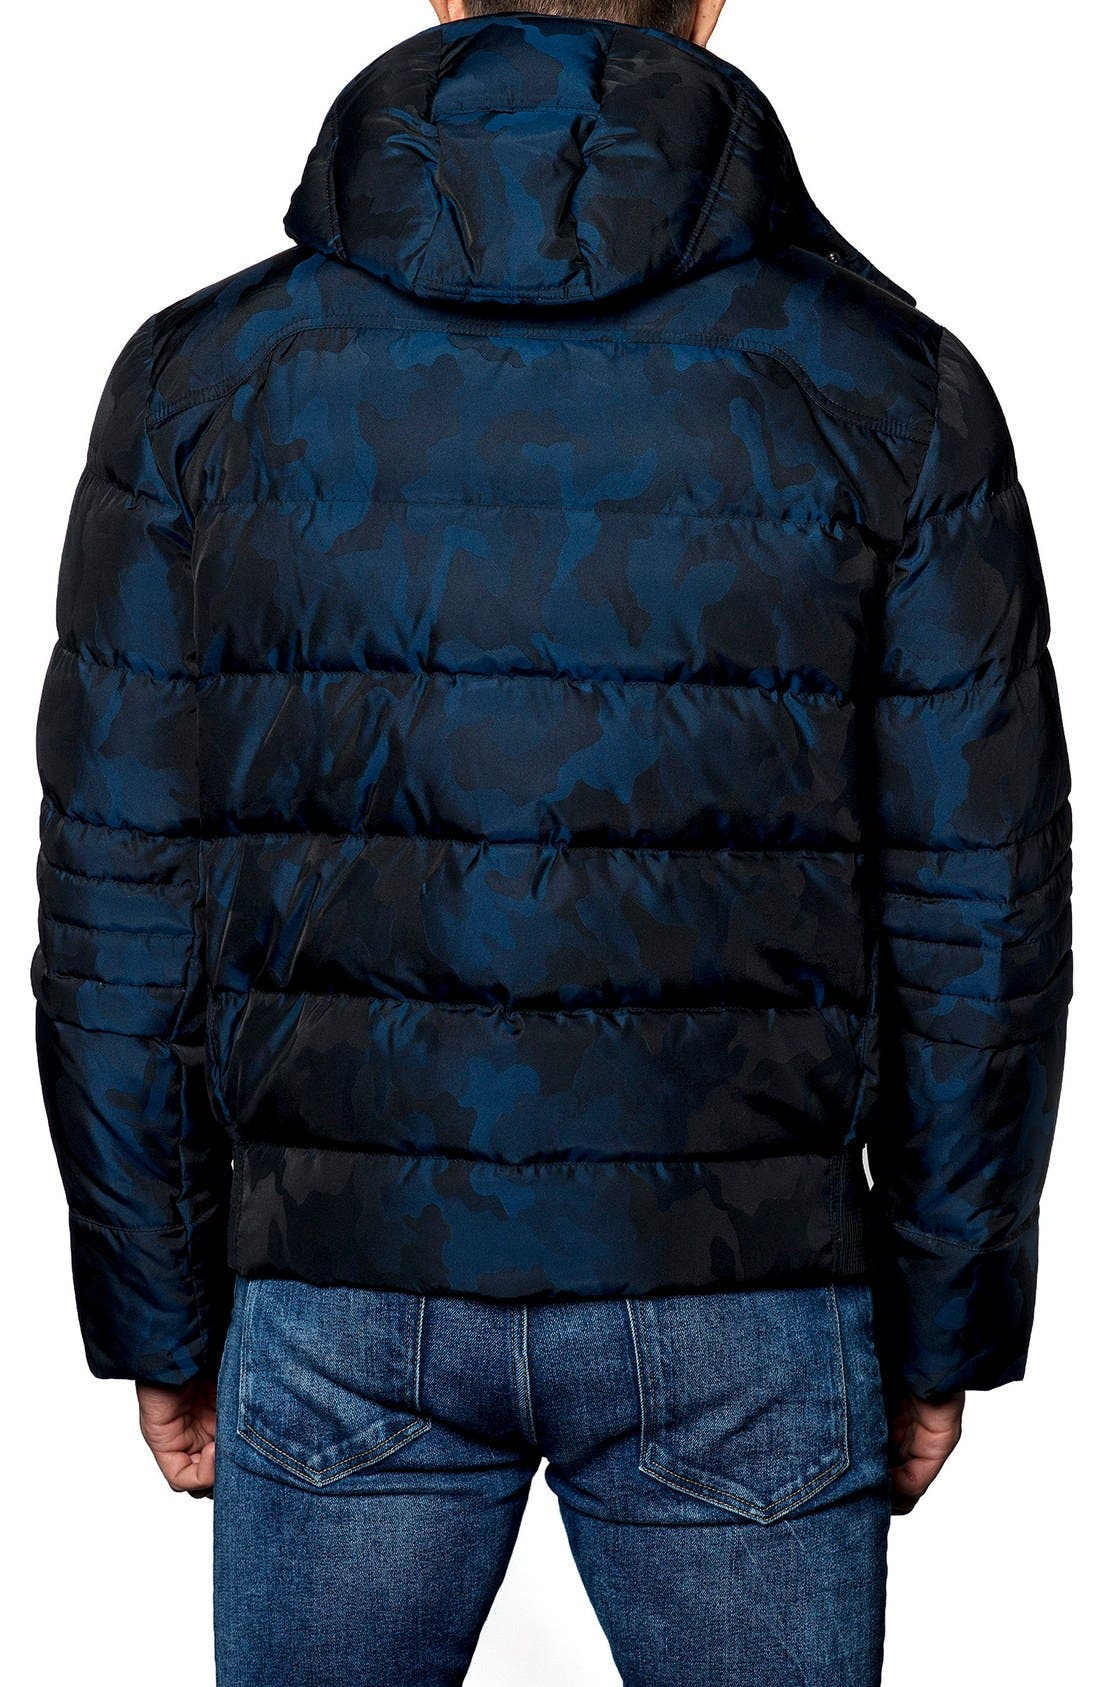 Alaska Camo Down Puffer Coat,                             Main thumbnail 1, color,                             410